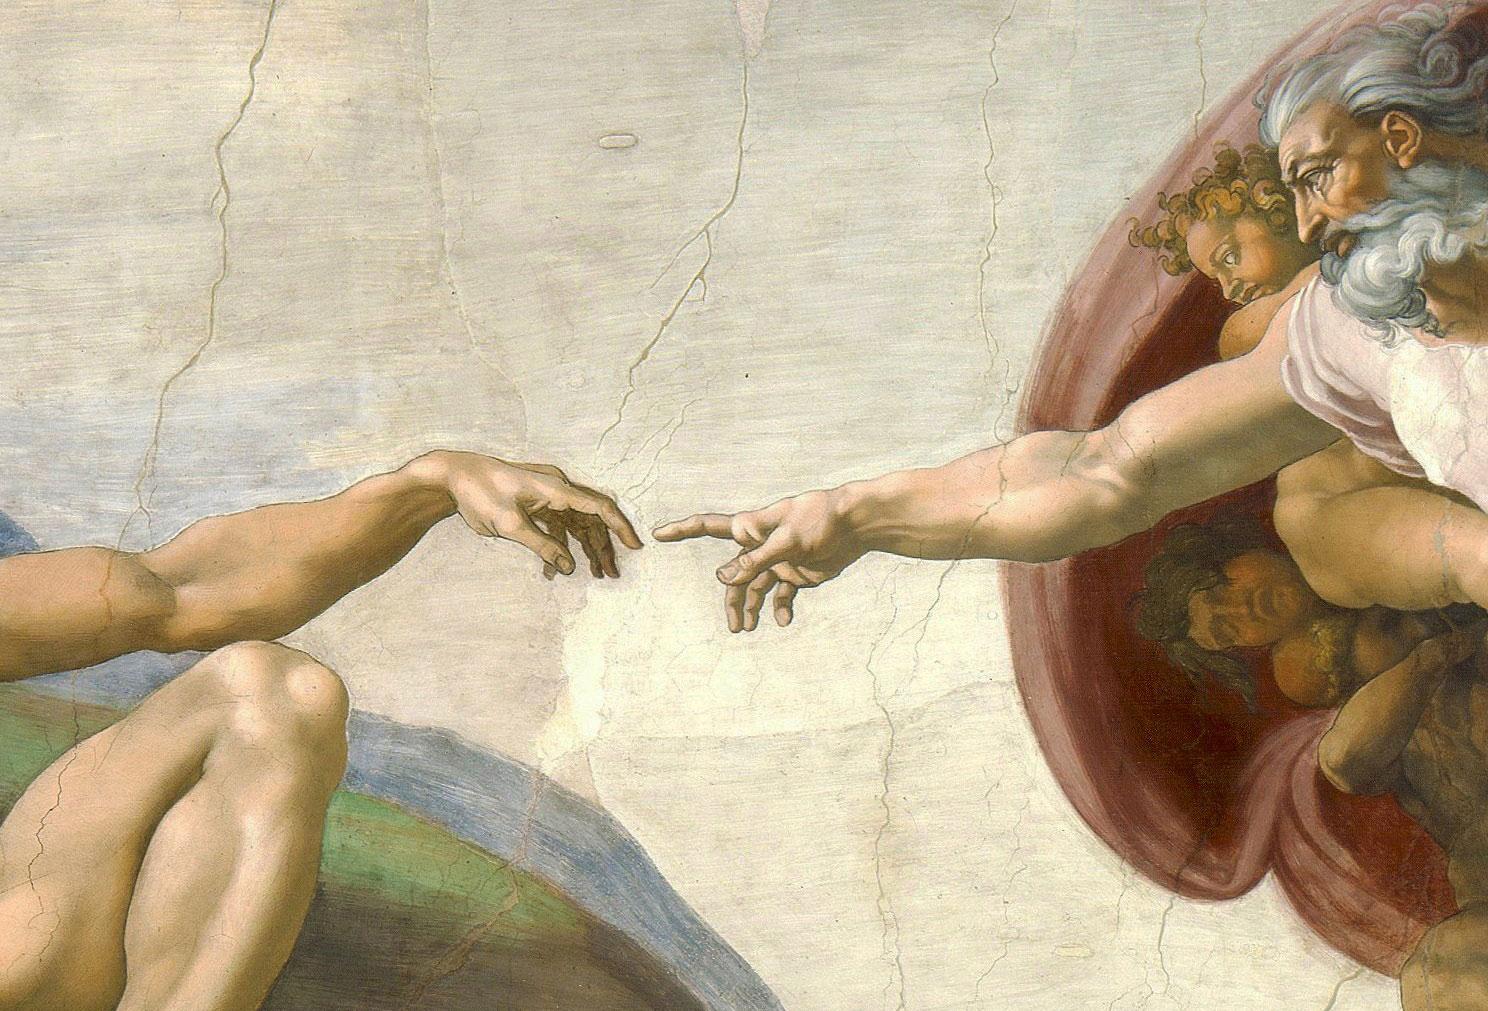 sistine chapel god and man relationship